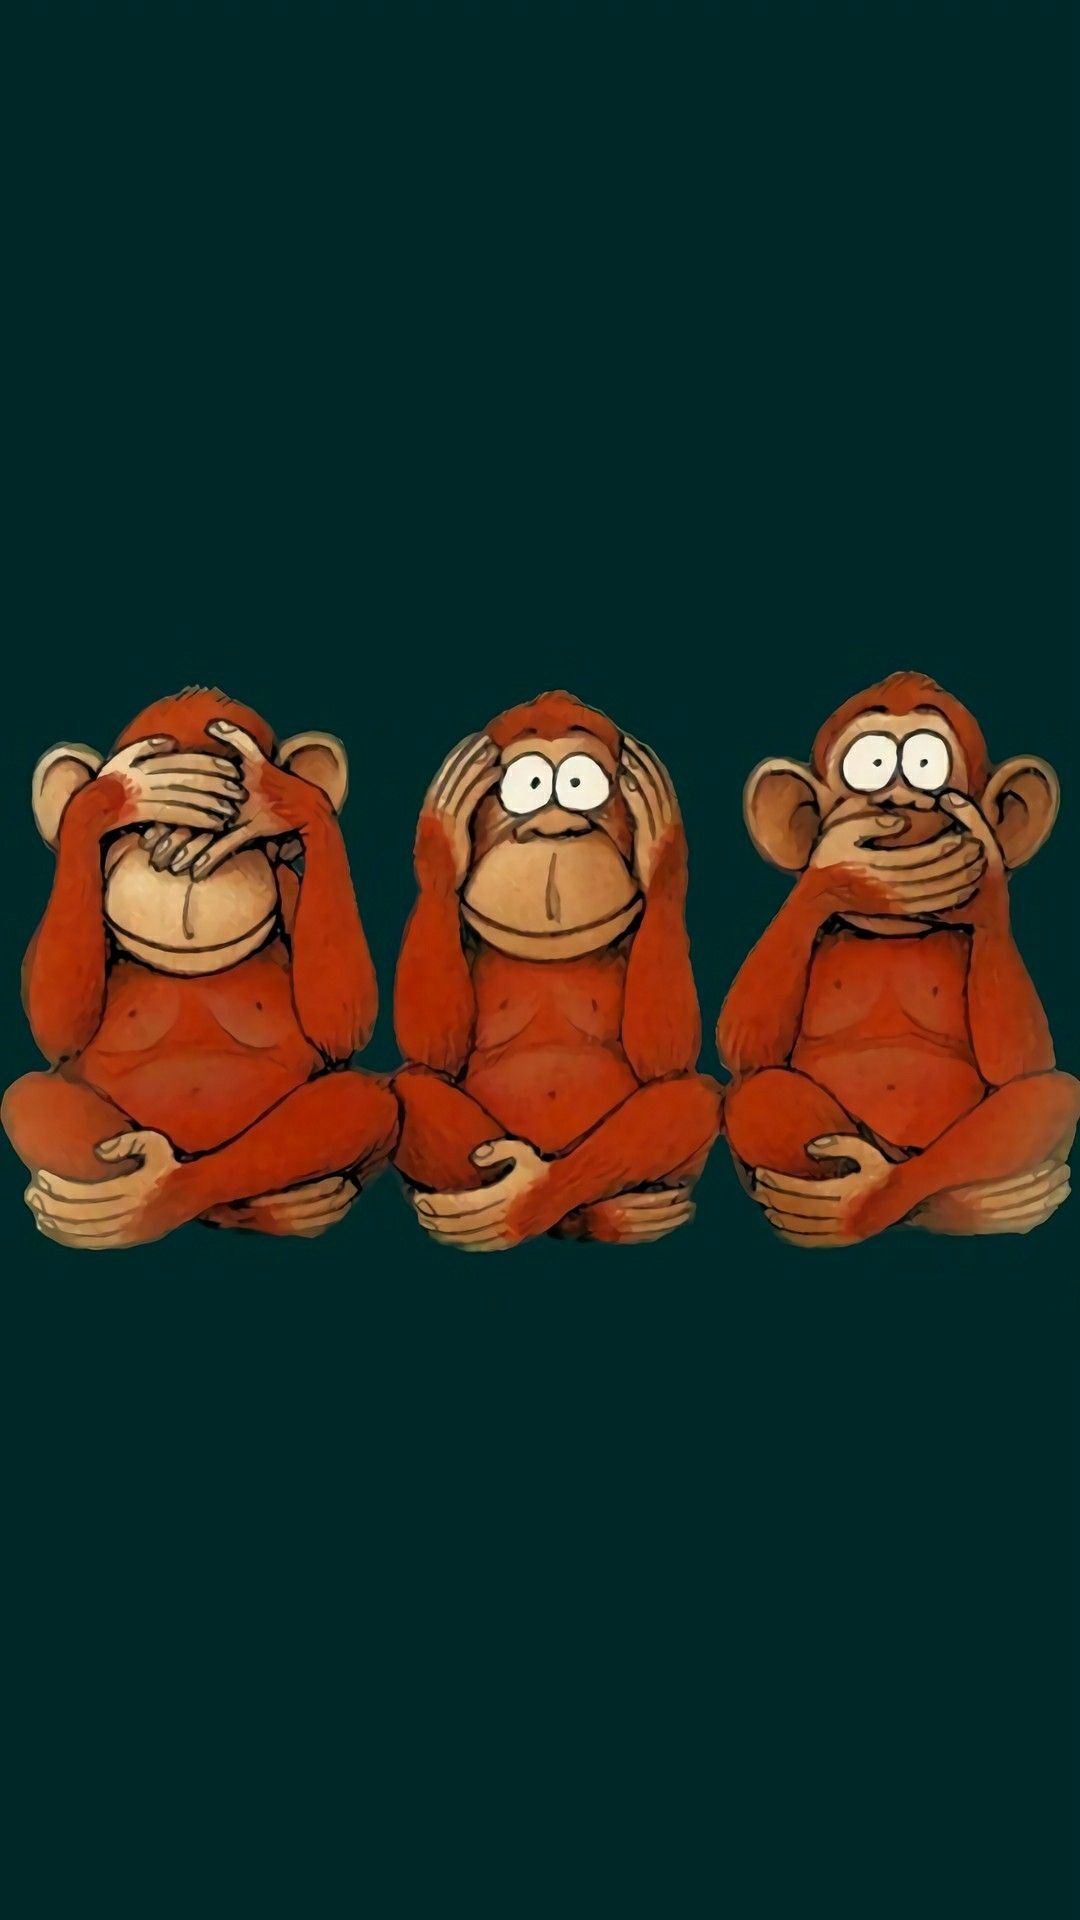 3 Monos Sabios Tatuajes tattoo   dibujos, tres monos sabios y personajes caricaturas